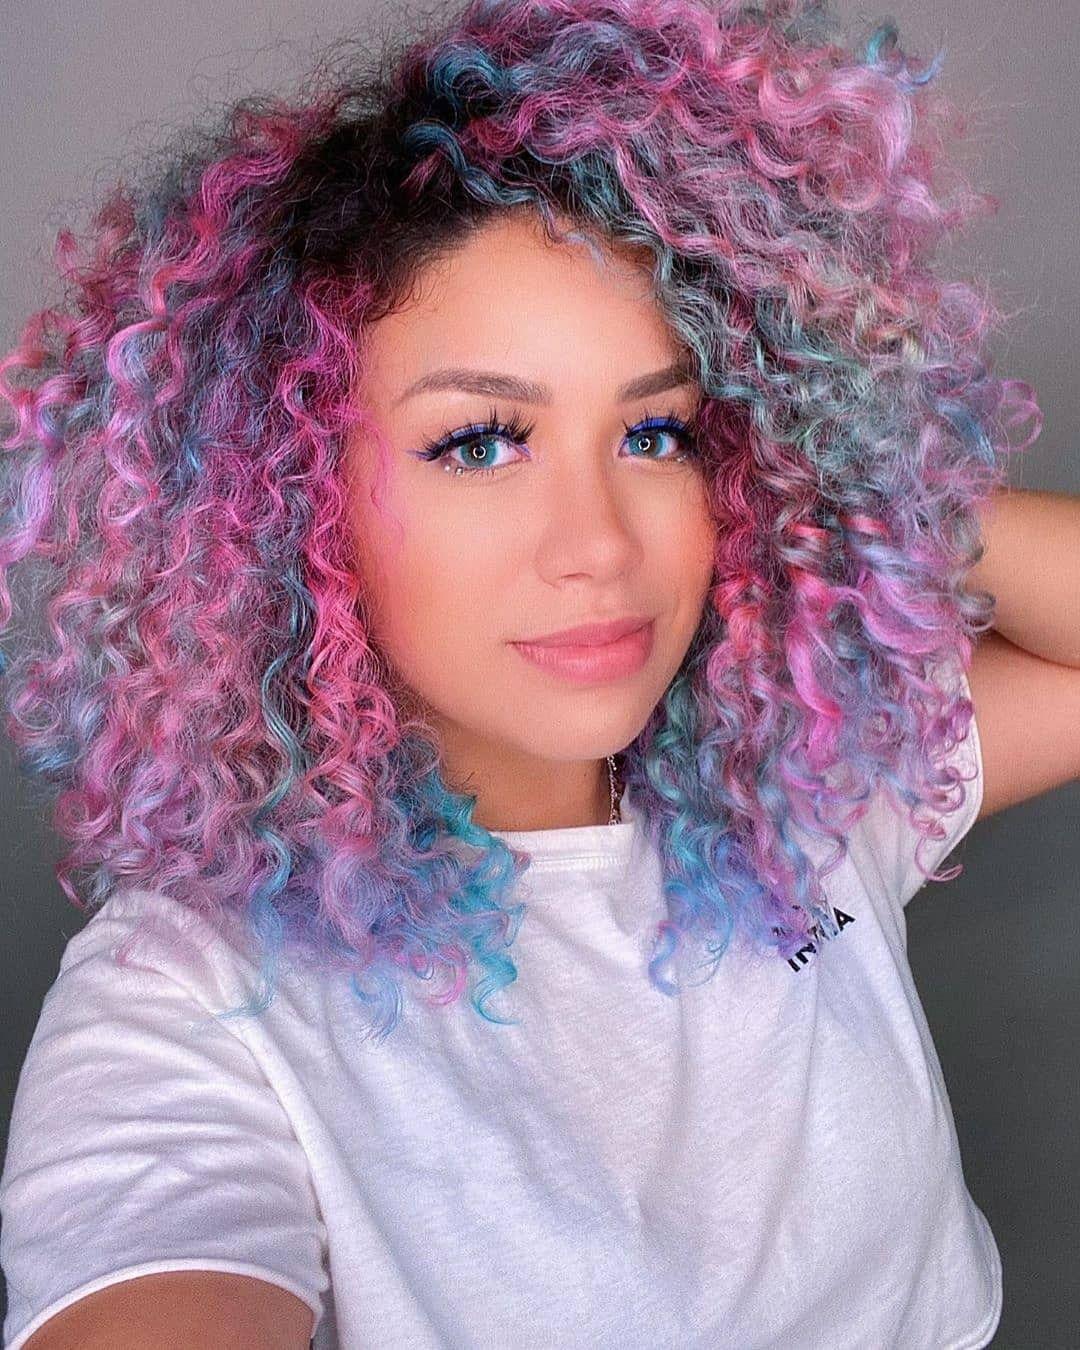 MOFAJANG® Hair Coloring Material in 2020 (With images